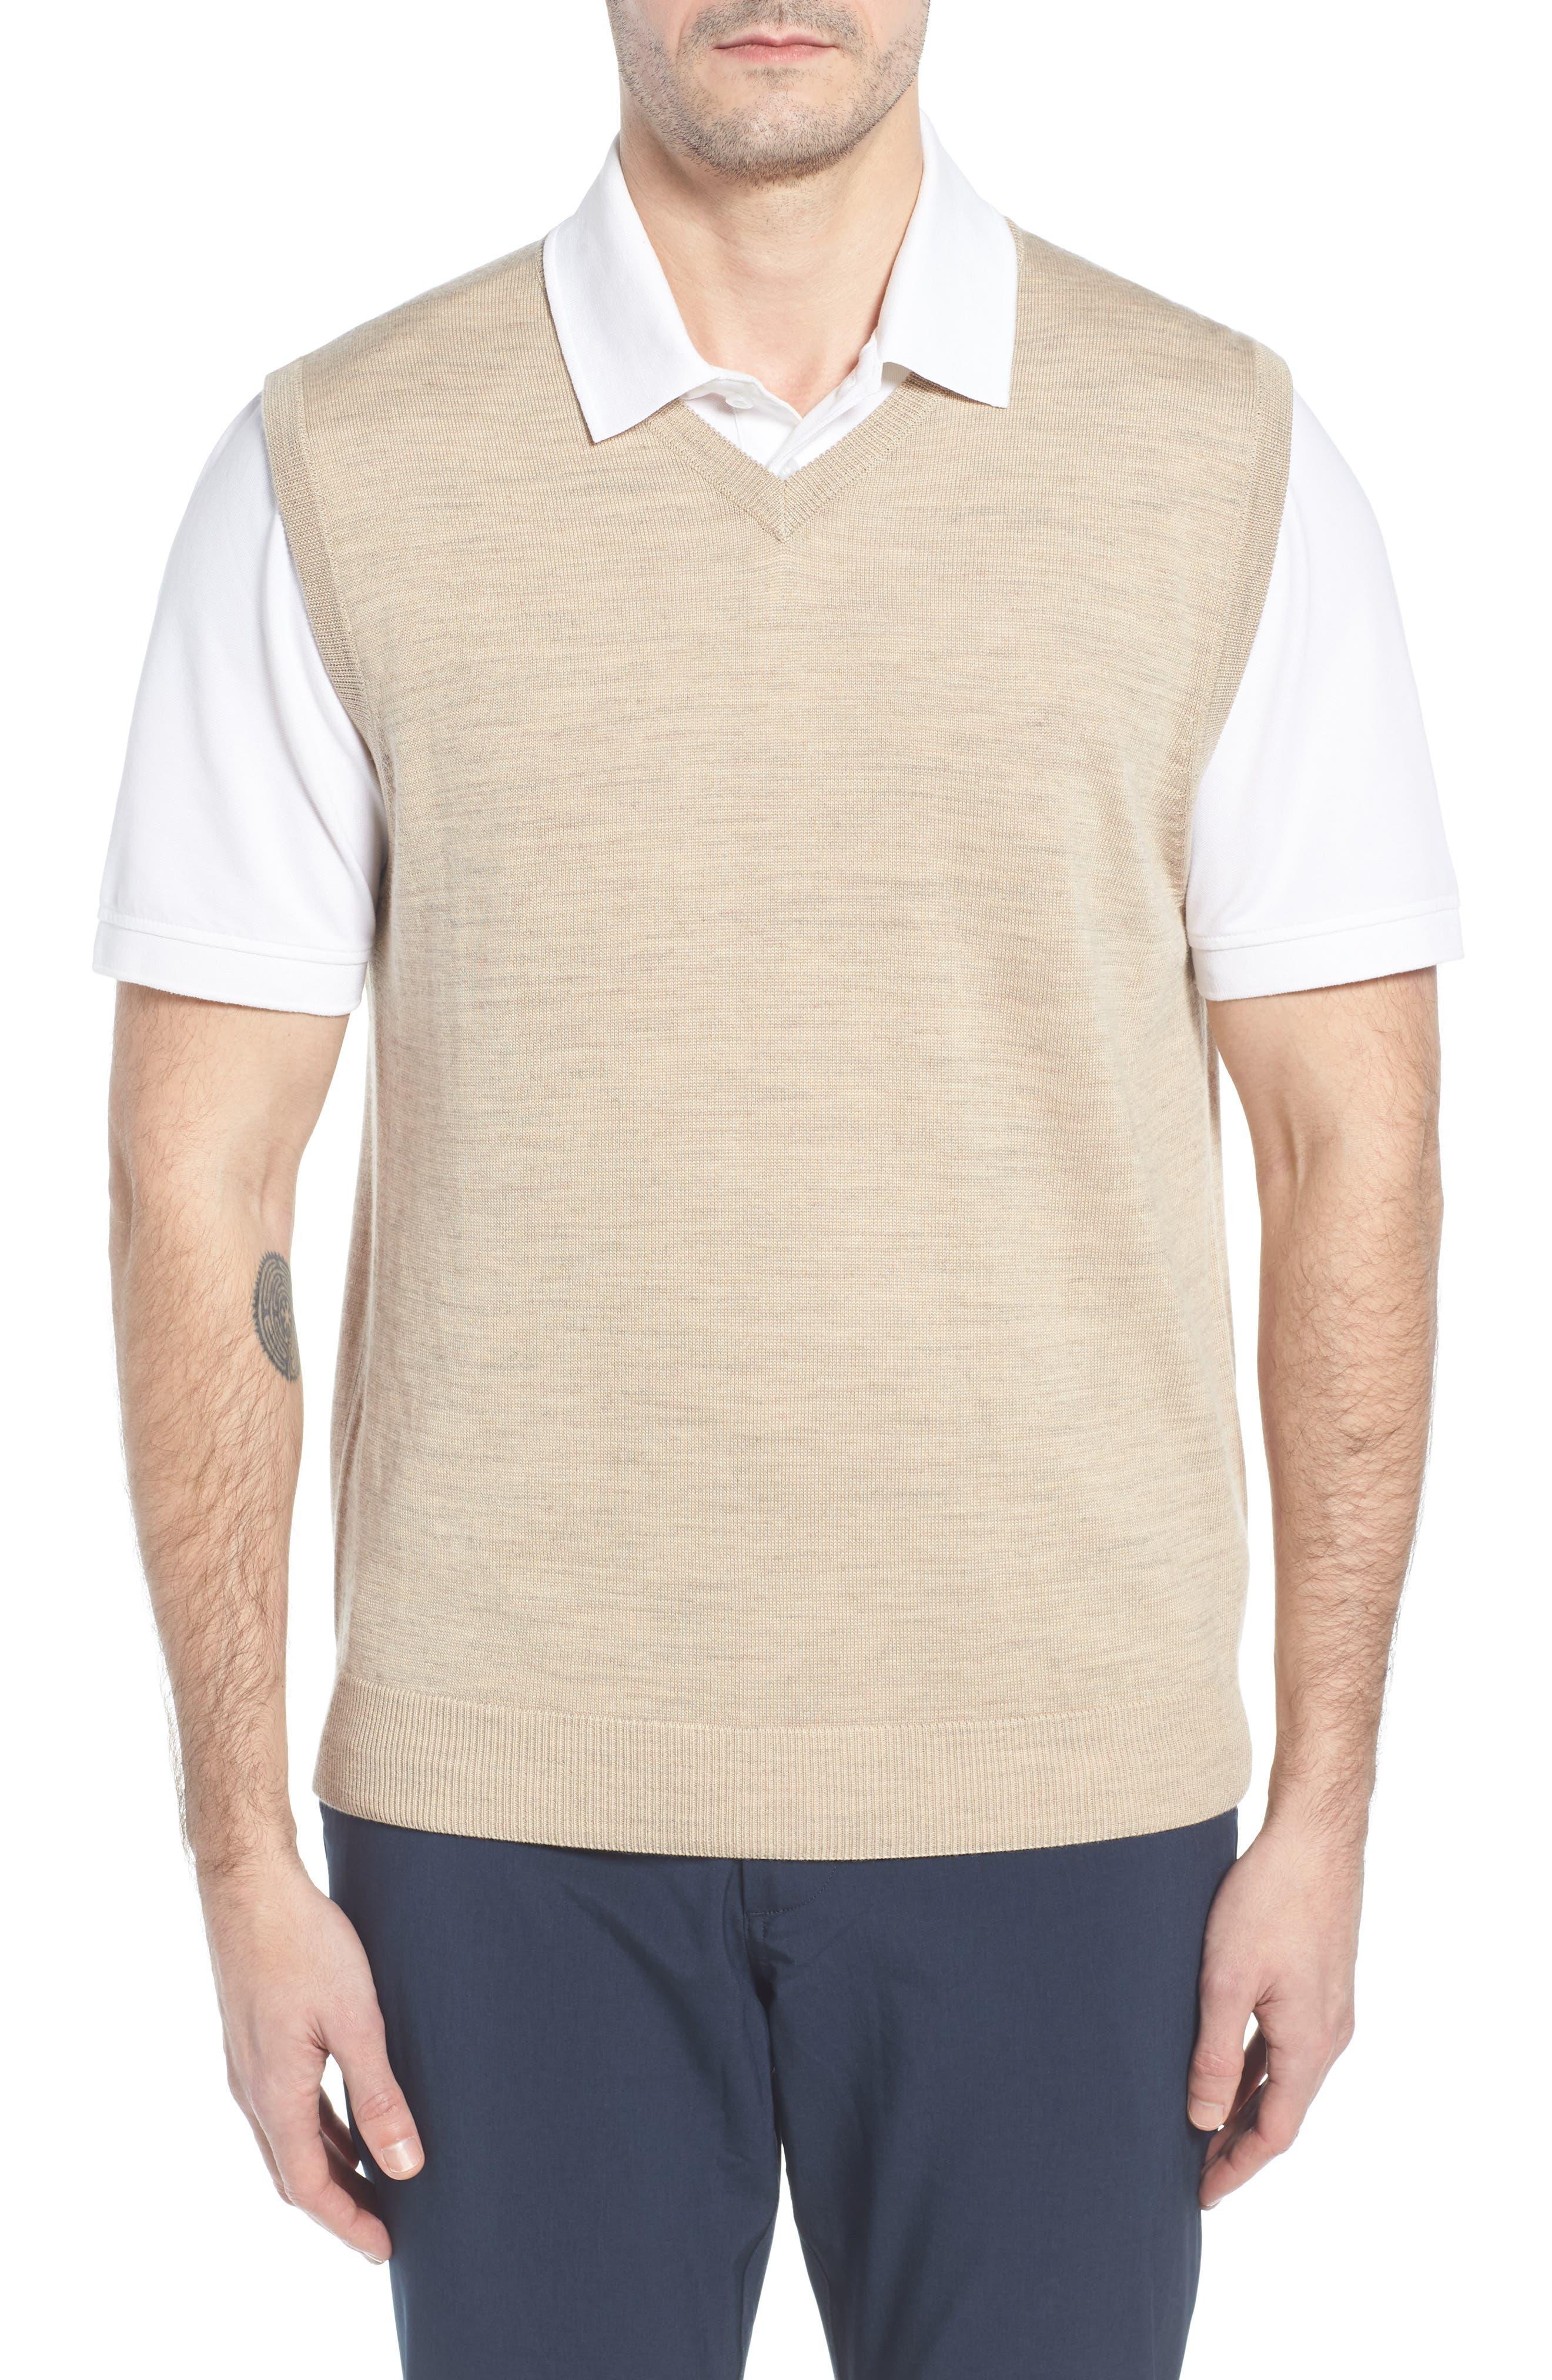 Douglas Merino Wool Blend V-Neck Vest,                         Main,                         color, Sand Heather